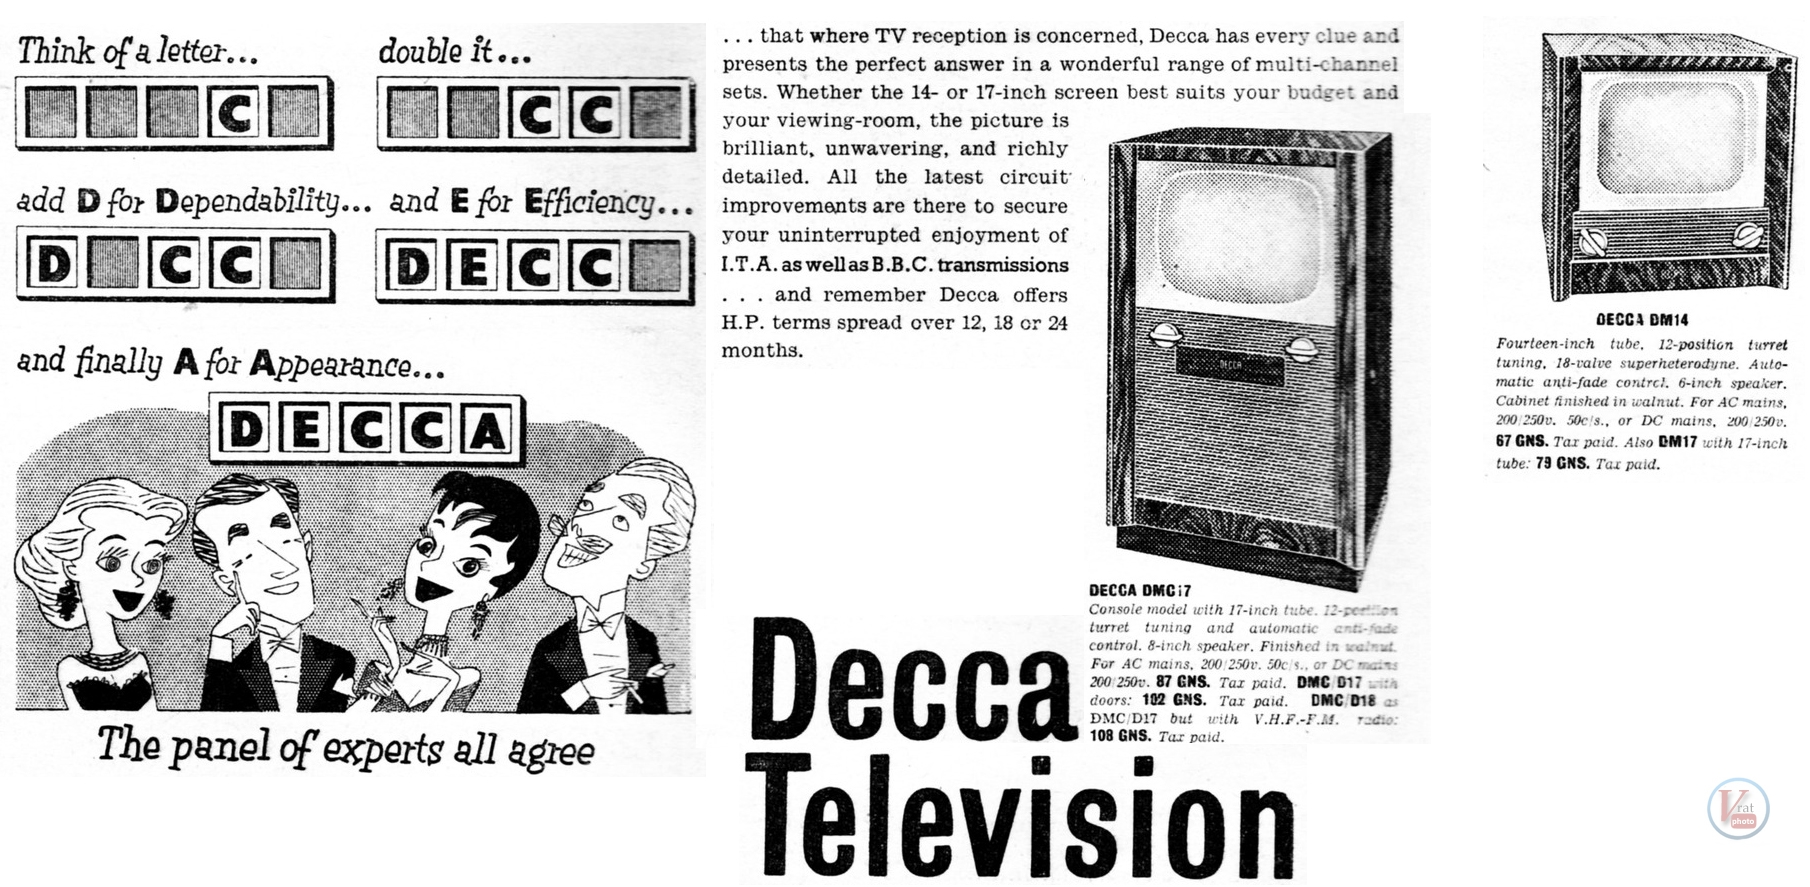 Decca B&W Televisions 12